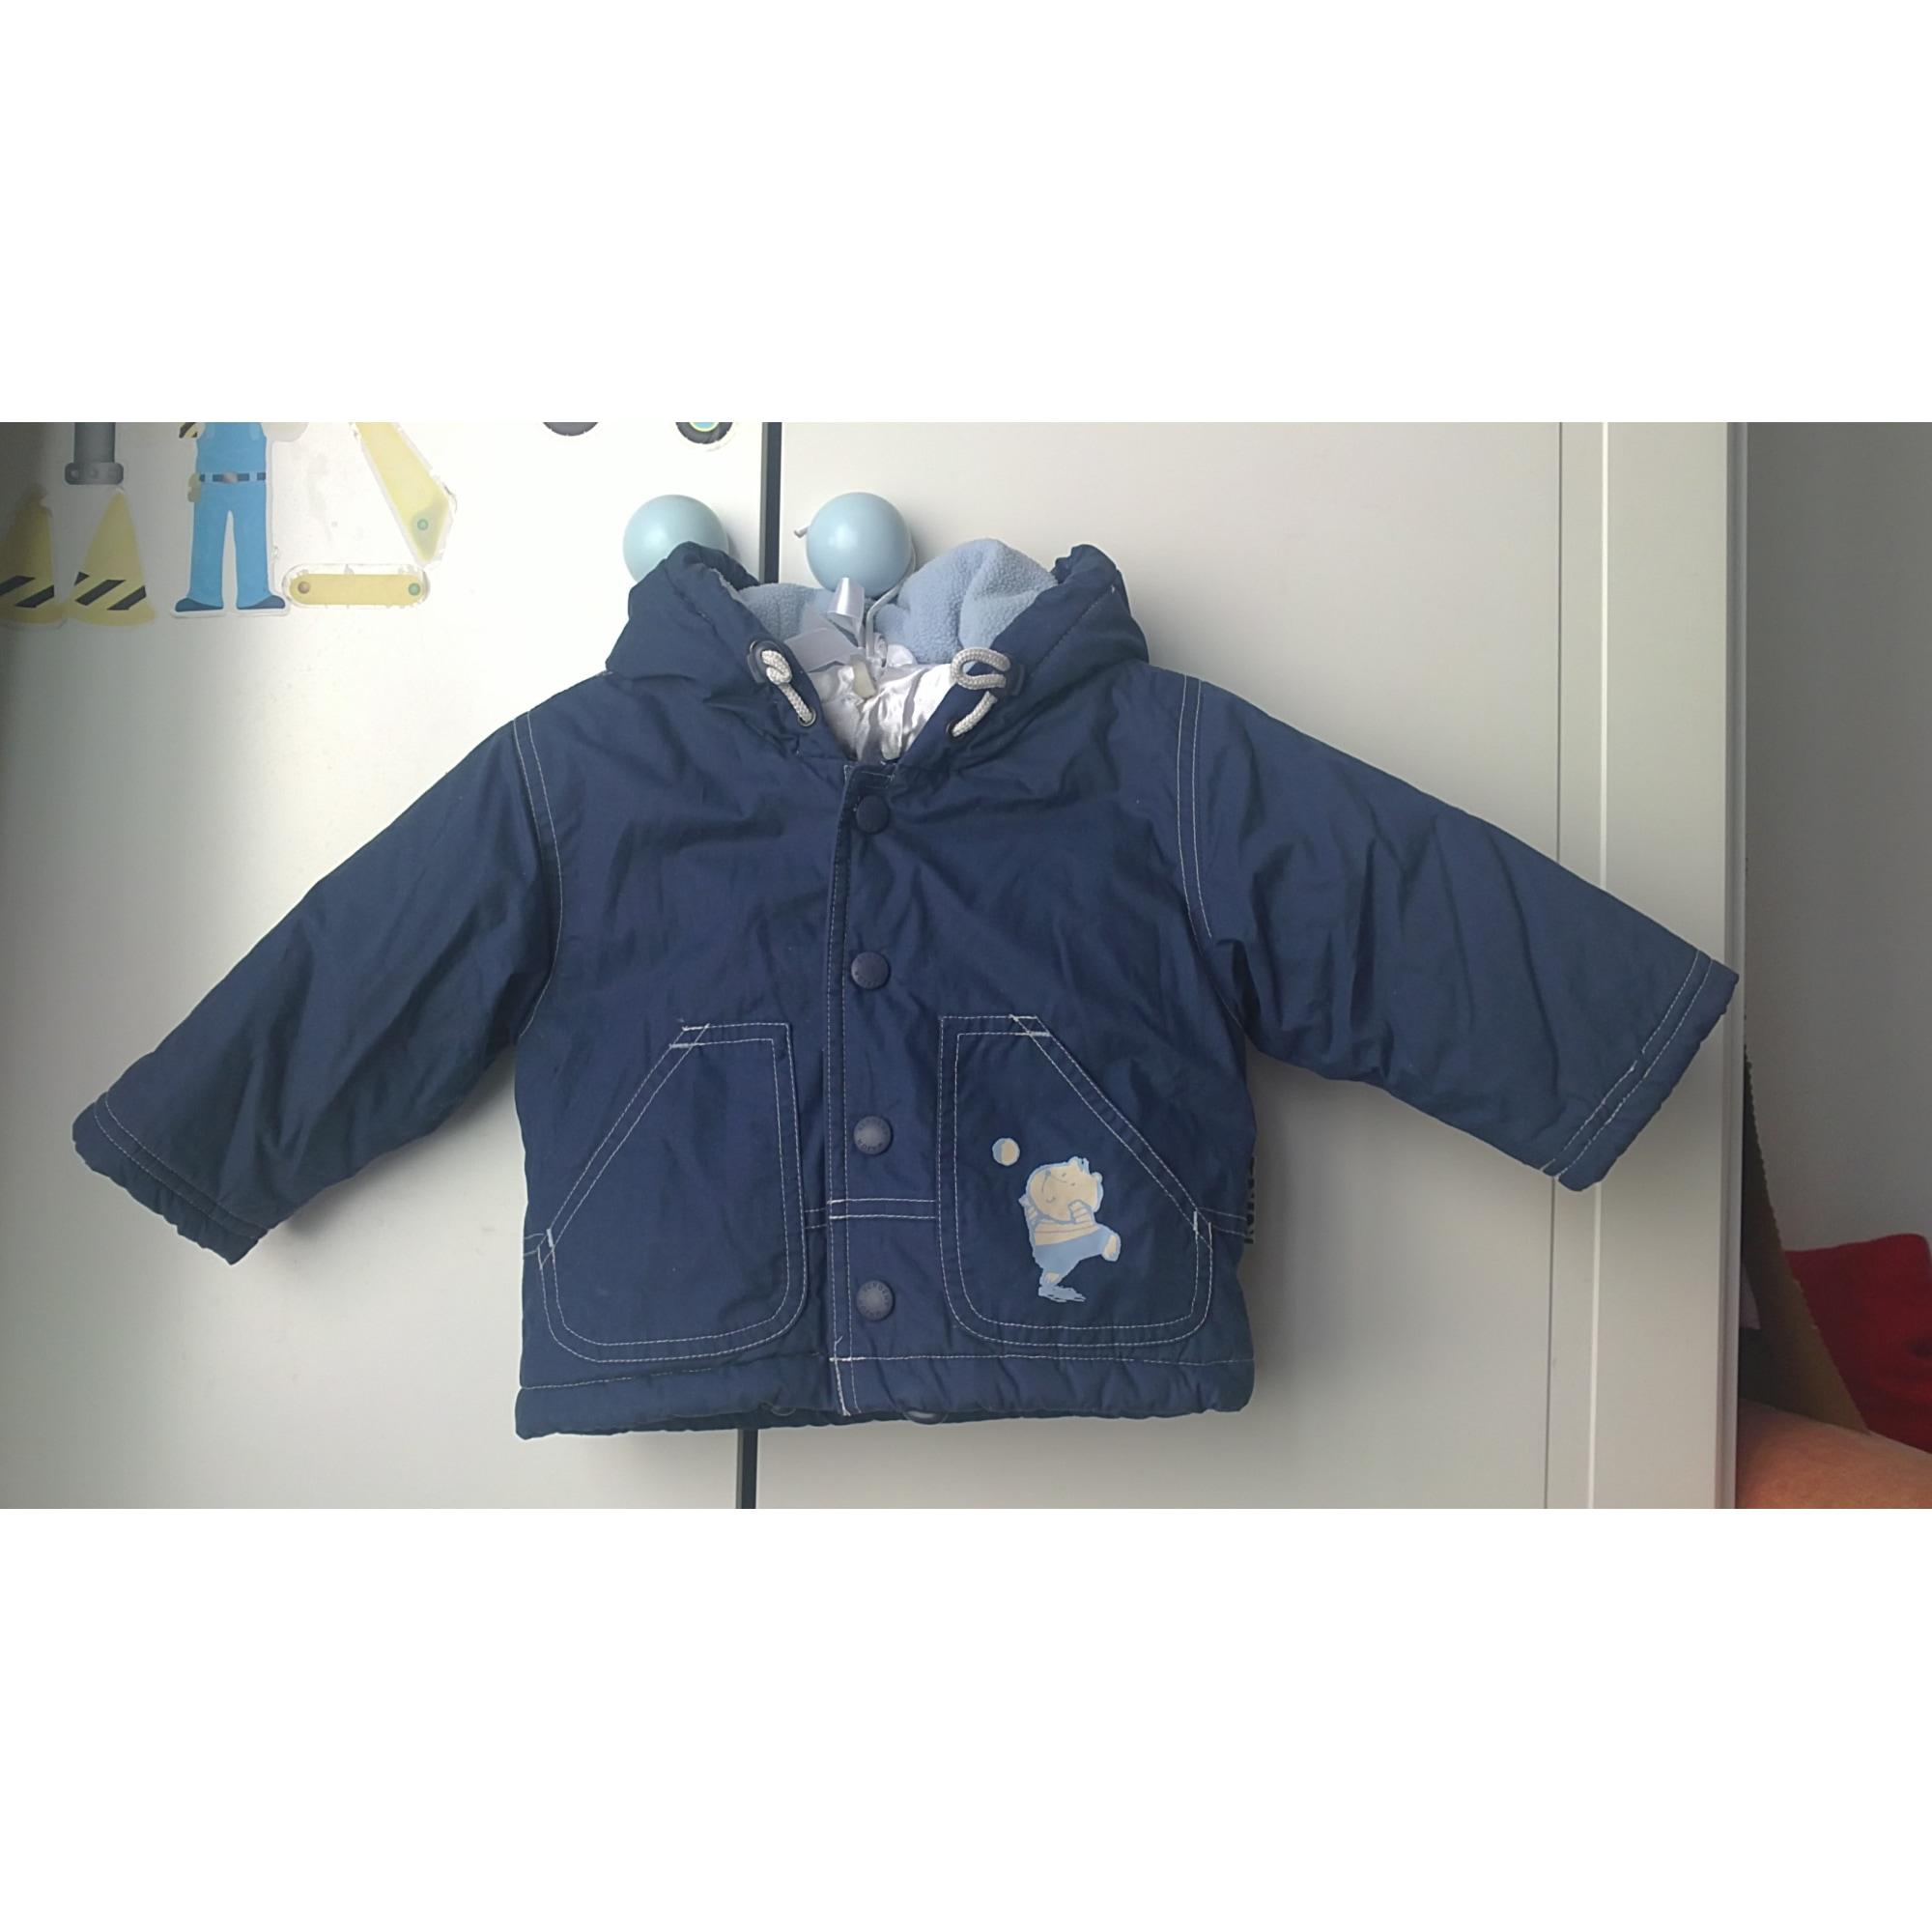 Manteau SERGENT MAJOR Bleu, bleu marine, bleu turquoise